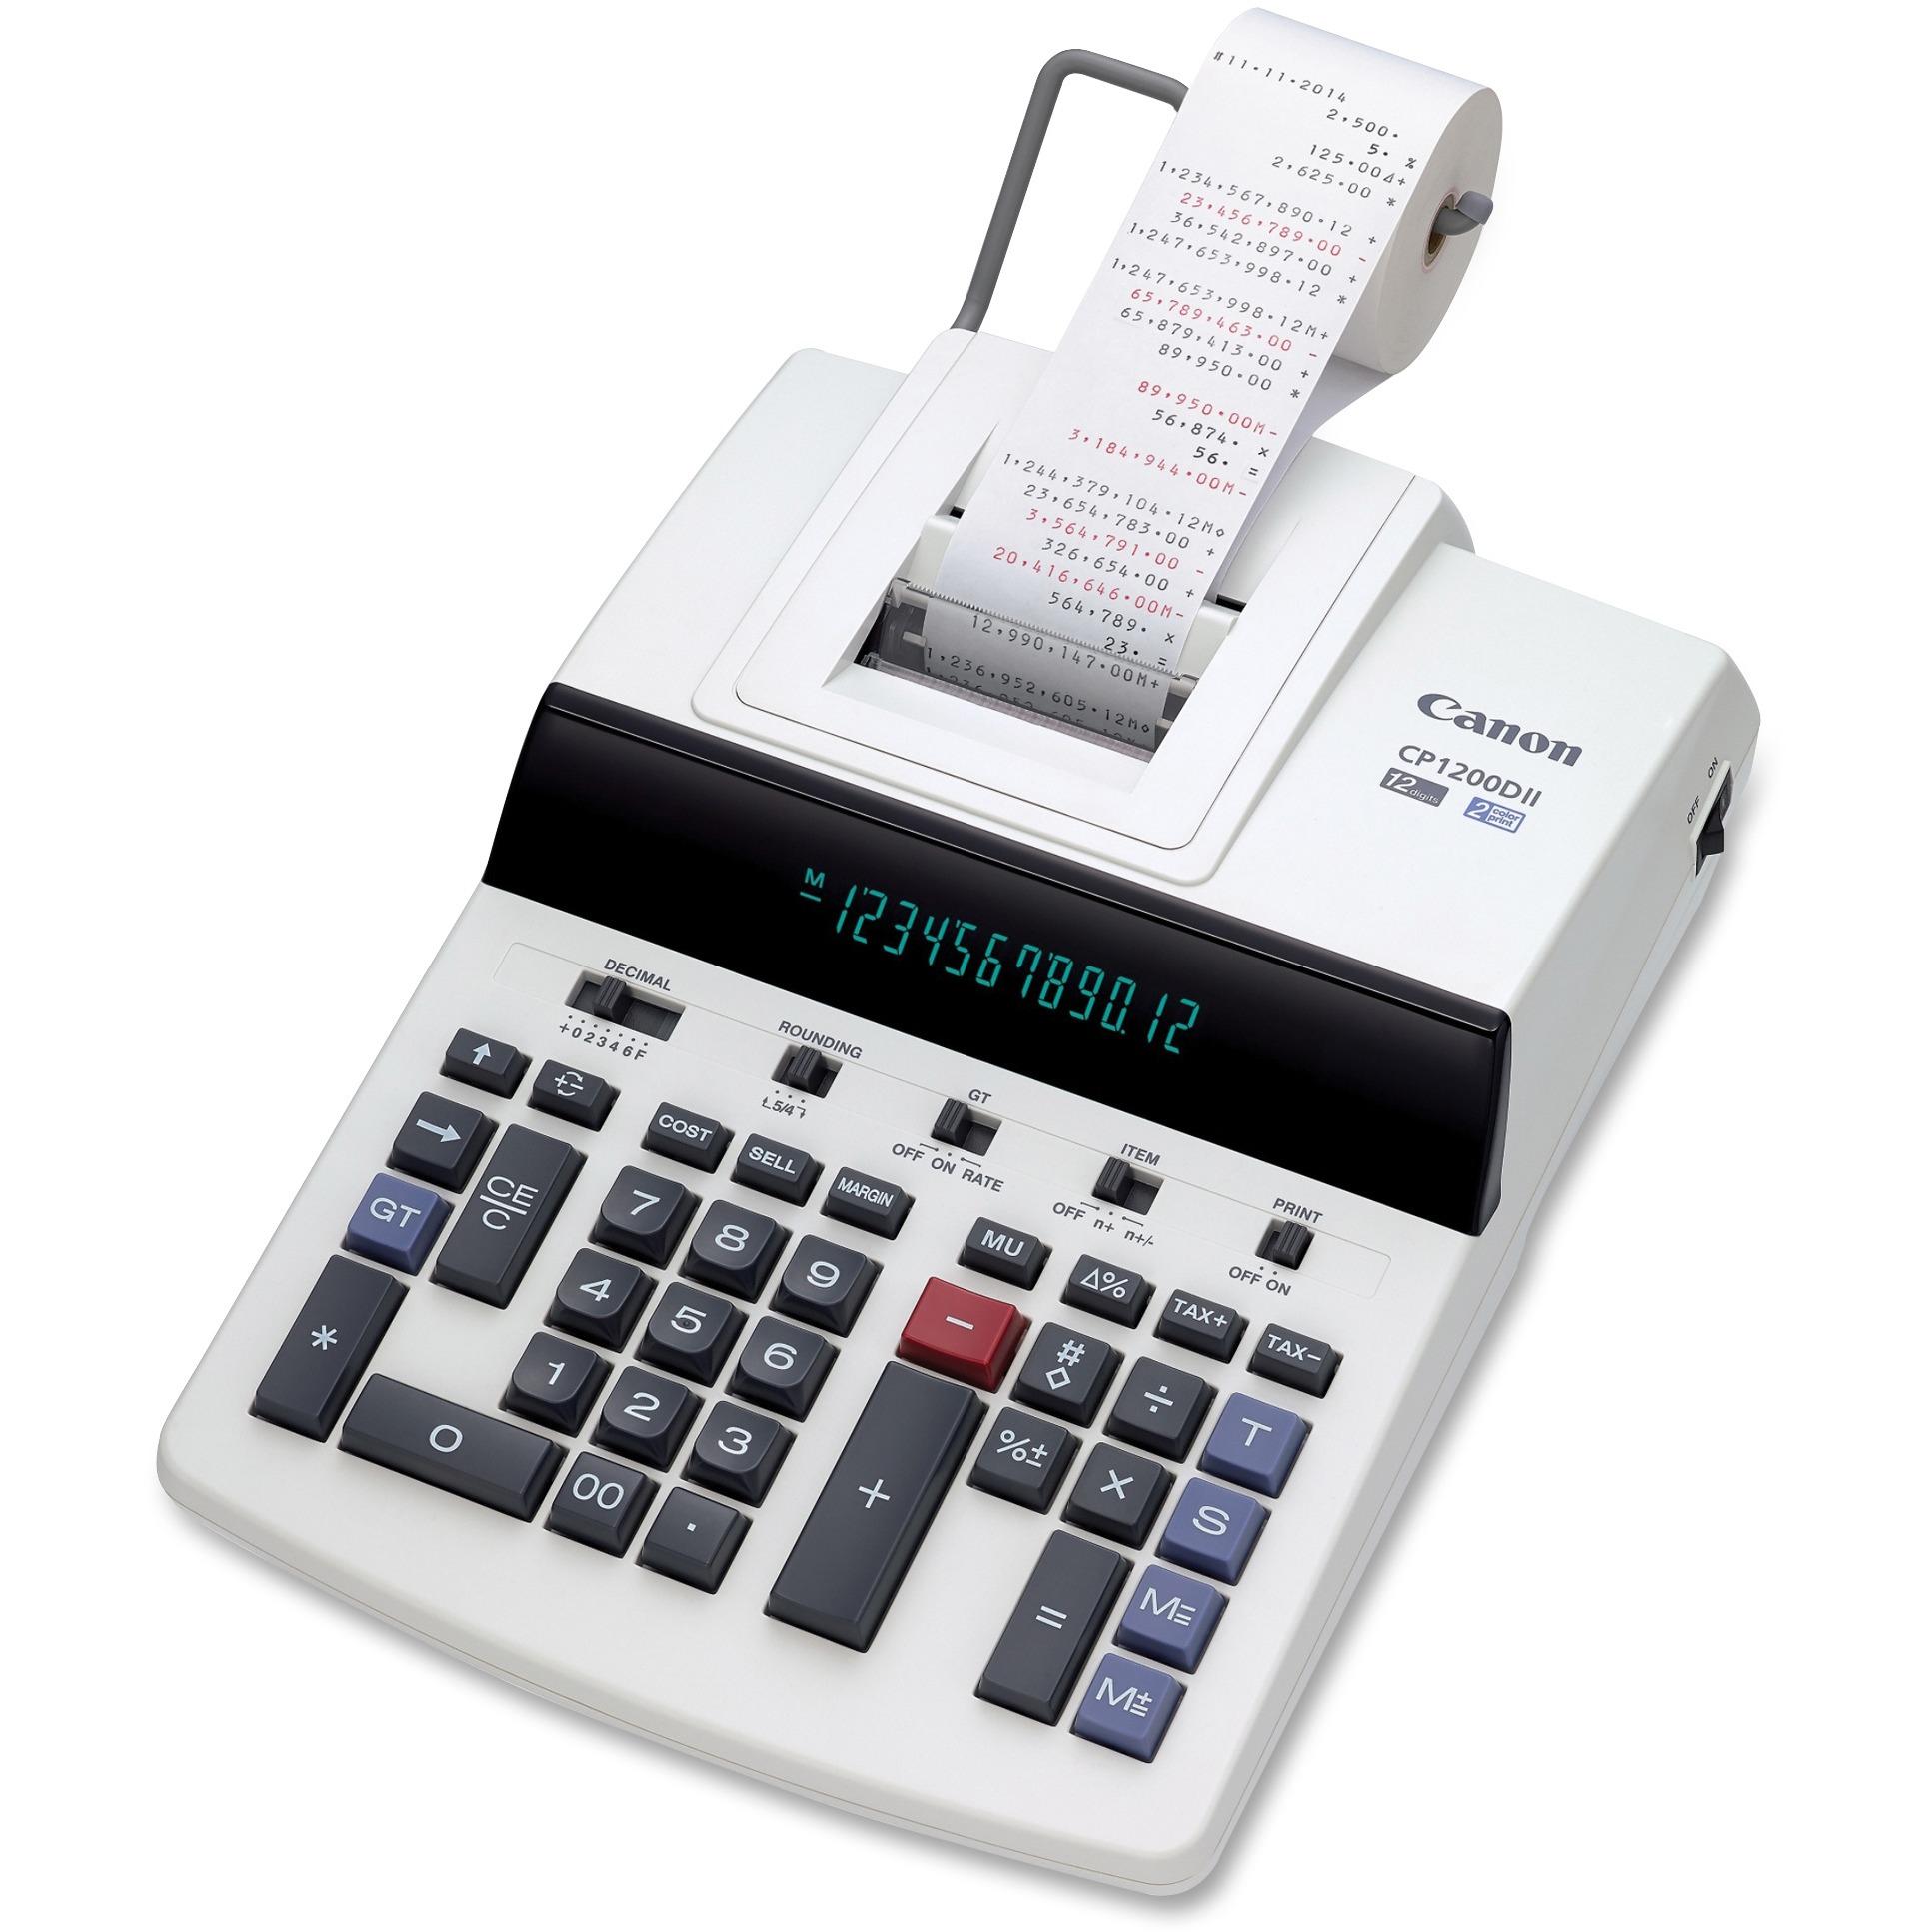 Canon CP1200DII 12-Digit Commercial Desktop Printing Calculator, BK/RD Print, 4.3L/Sec